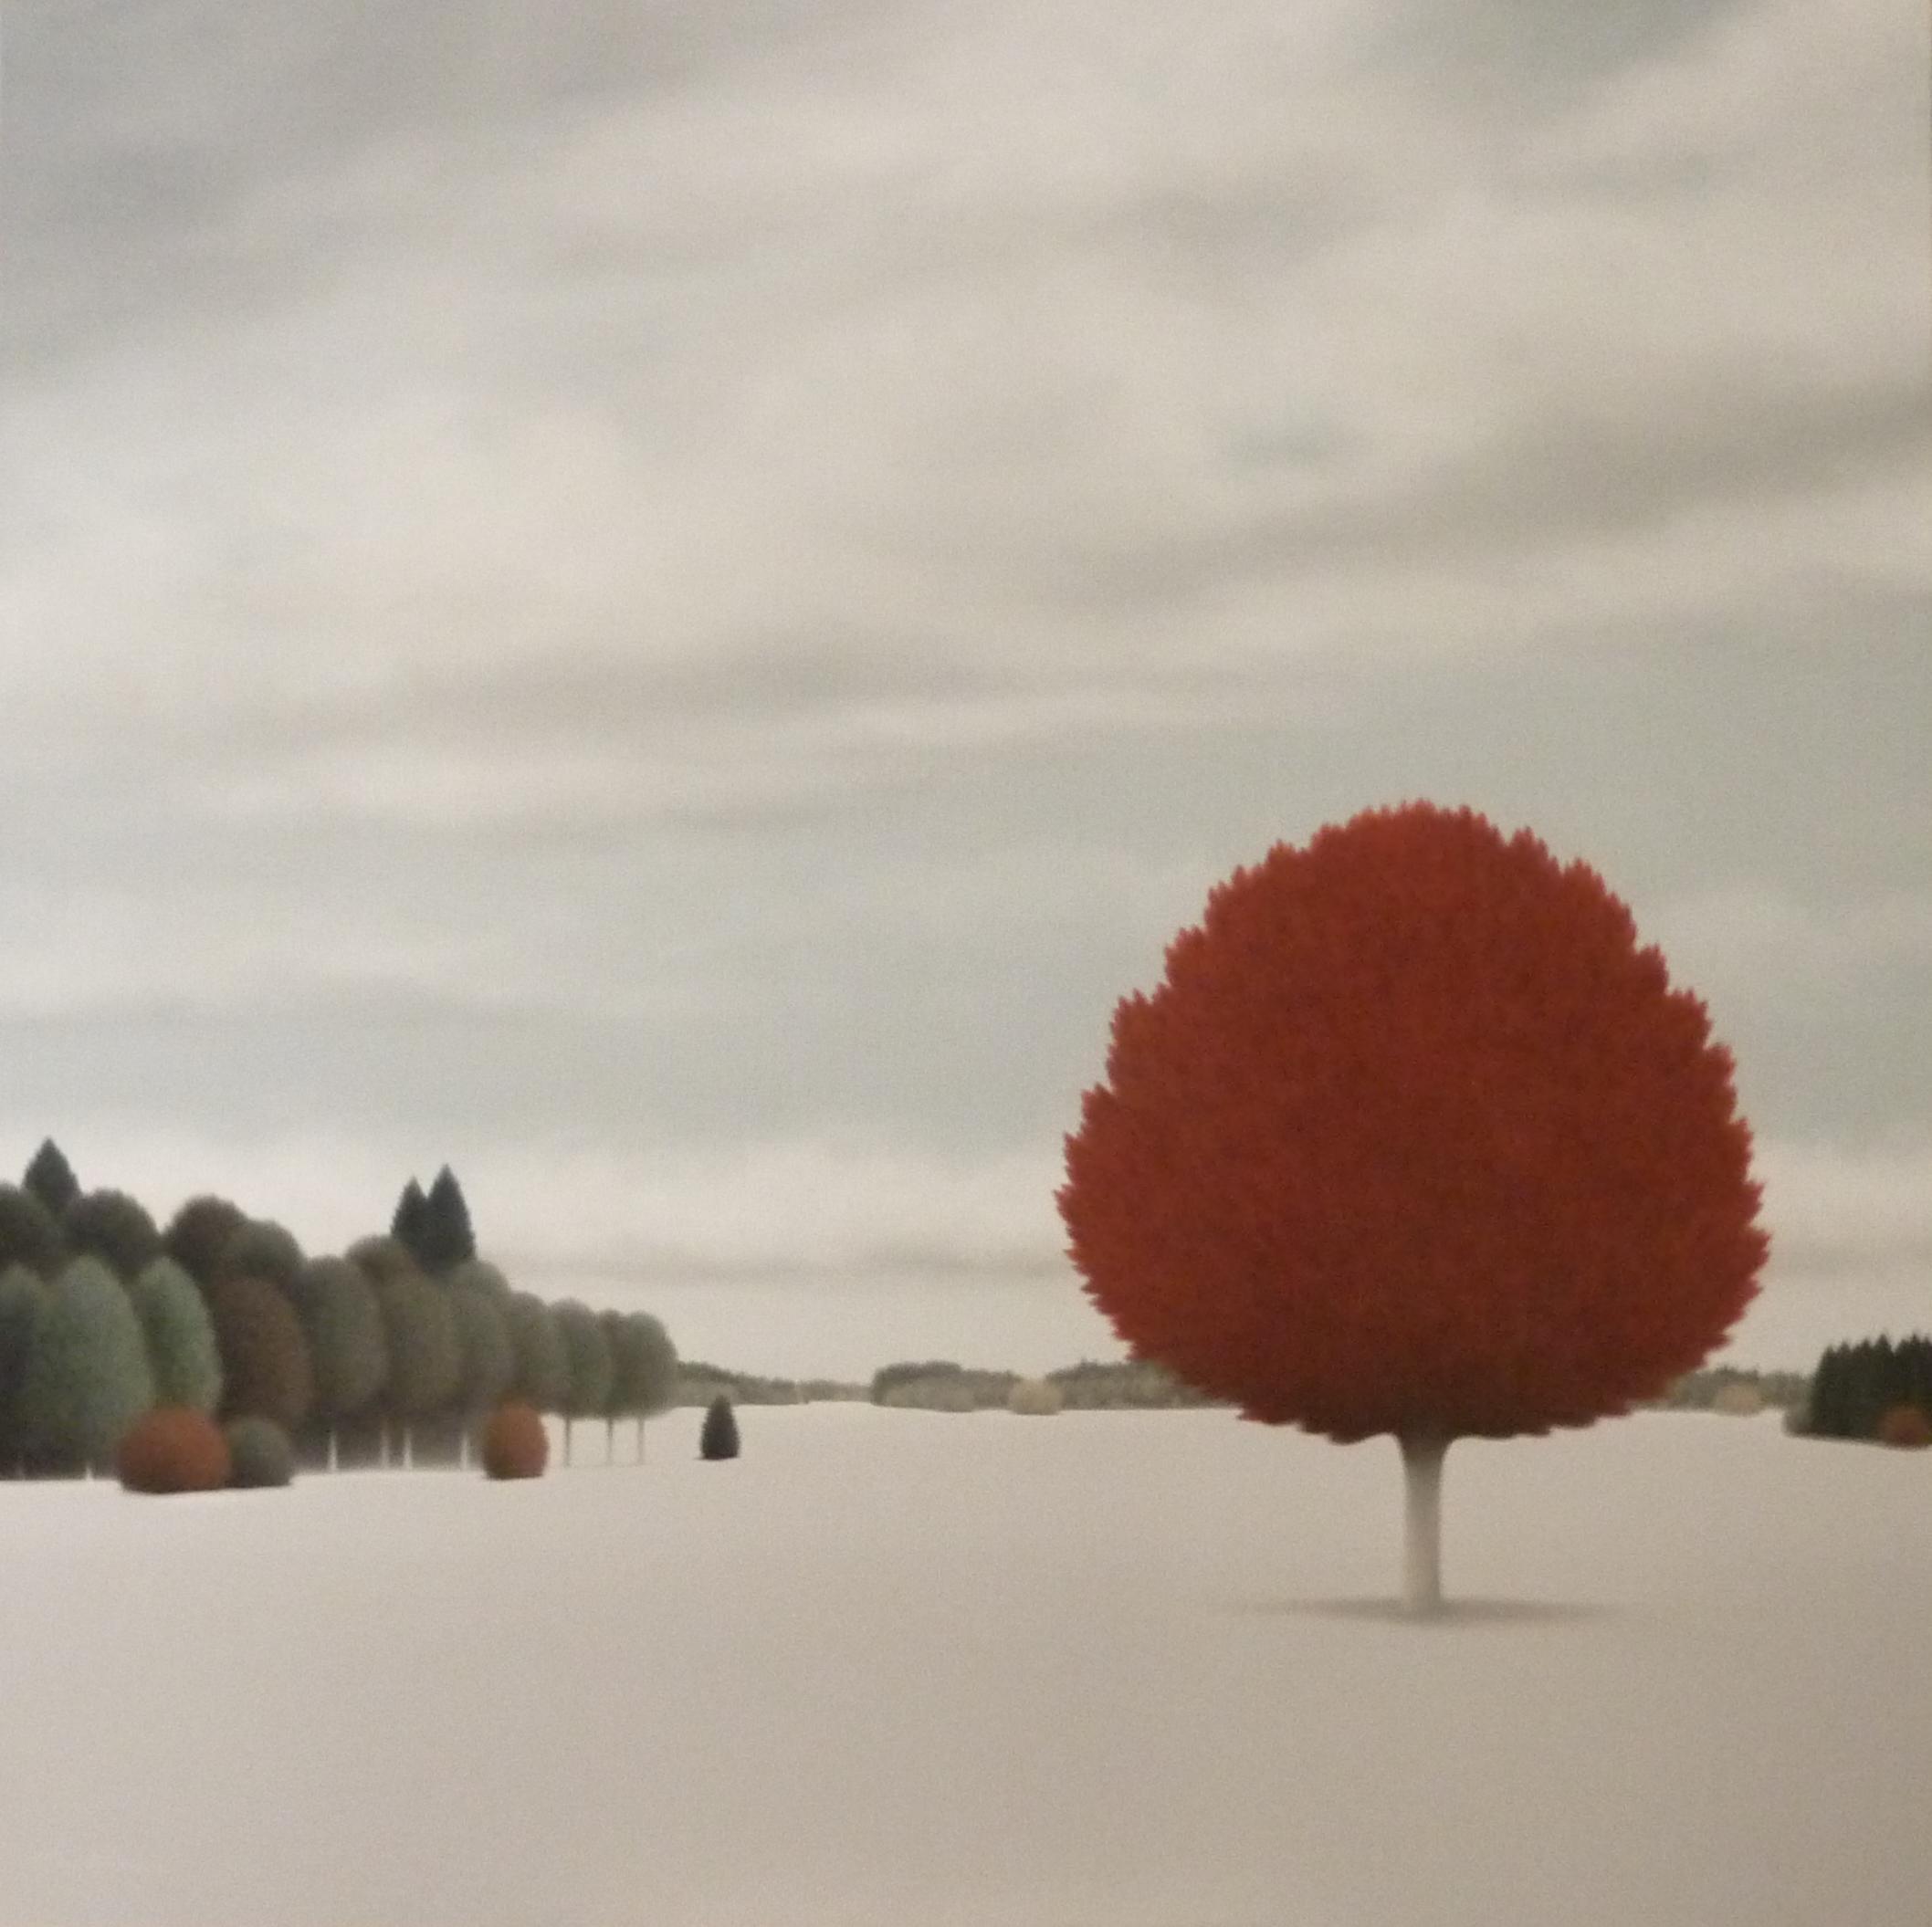 LW100. Inner Land-I. Tríptico. Óleo sobre lienzo. 130 x 130 cm. 2019. 5900 euros